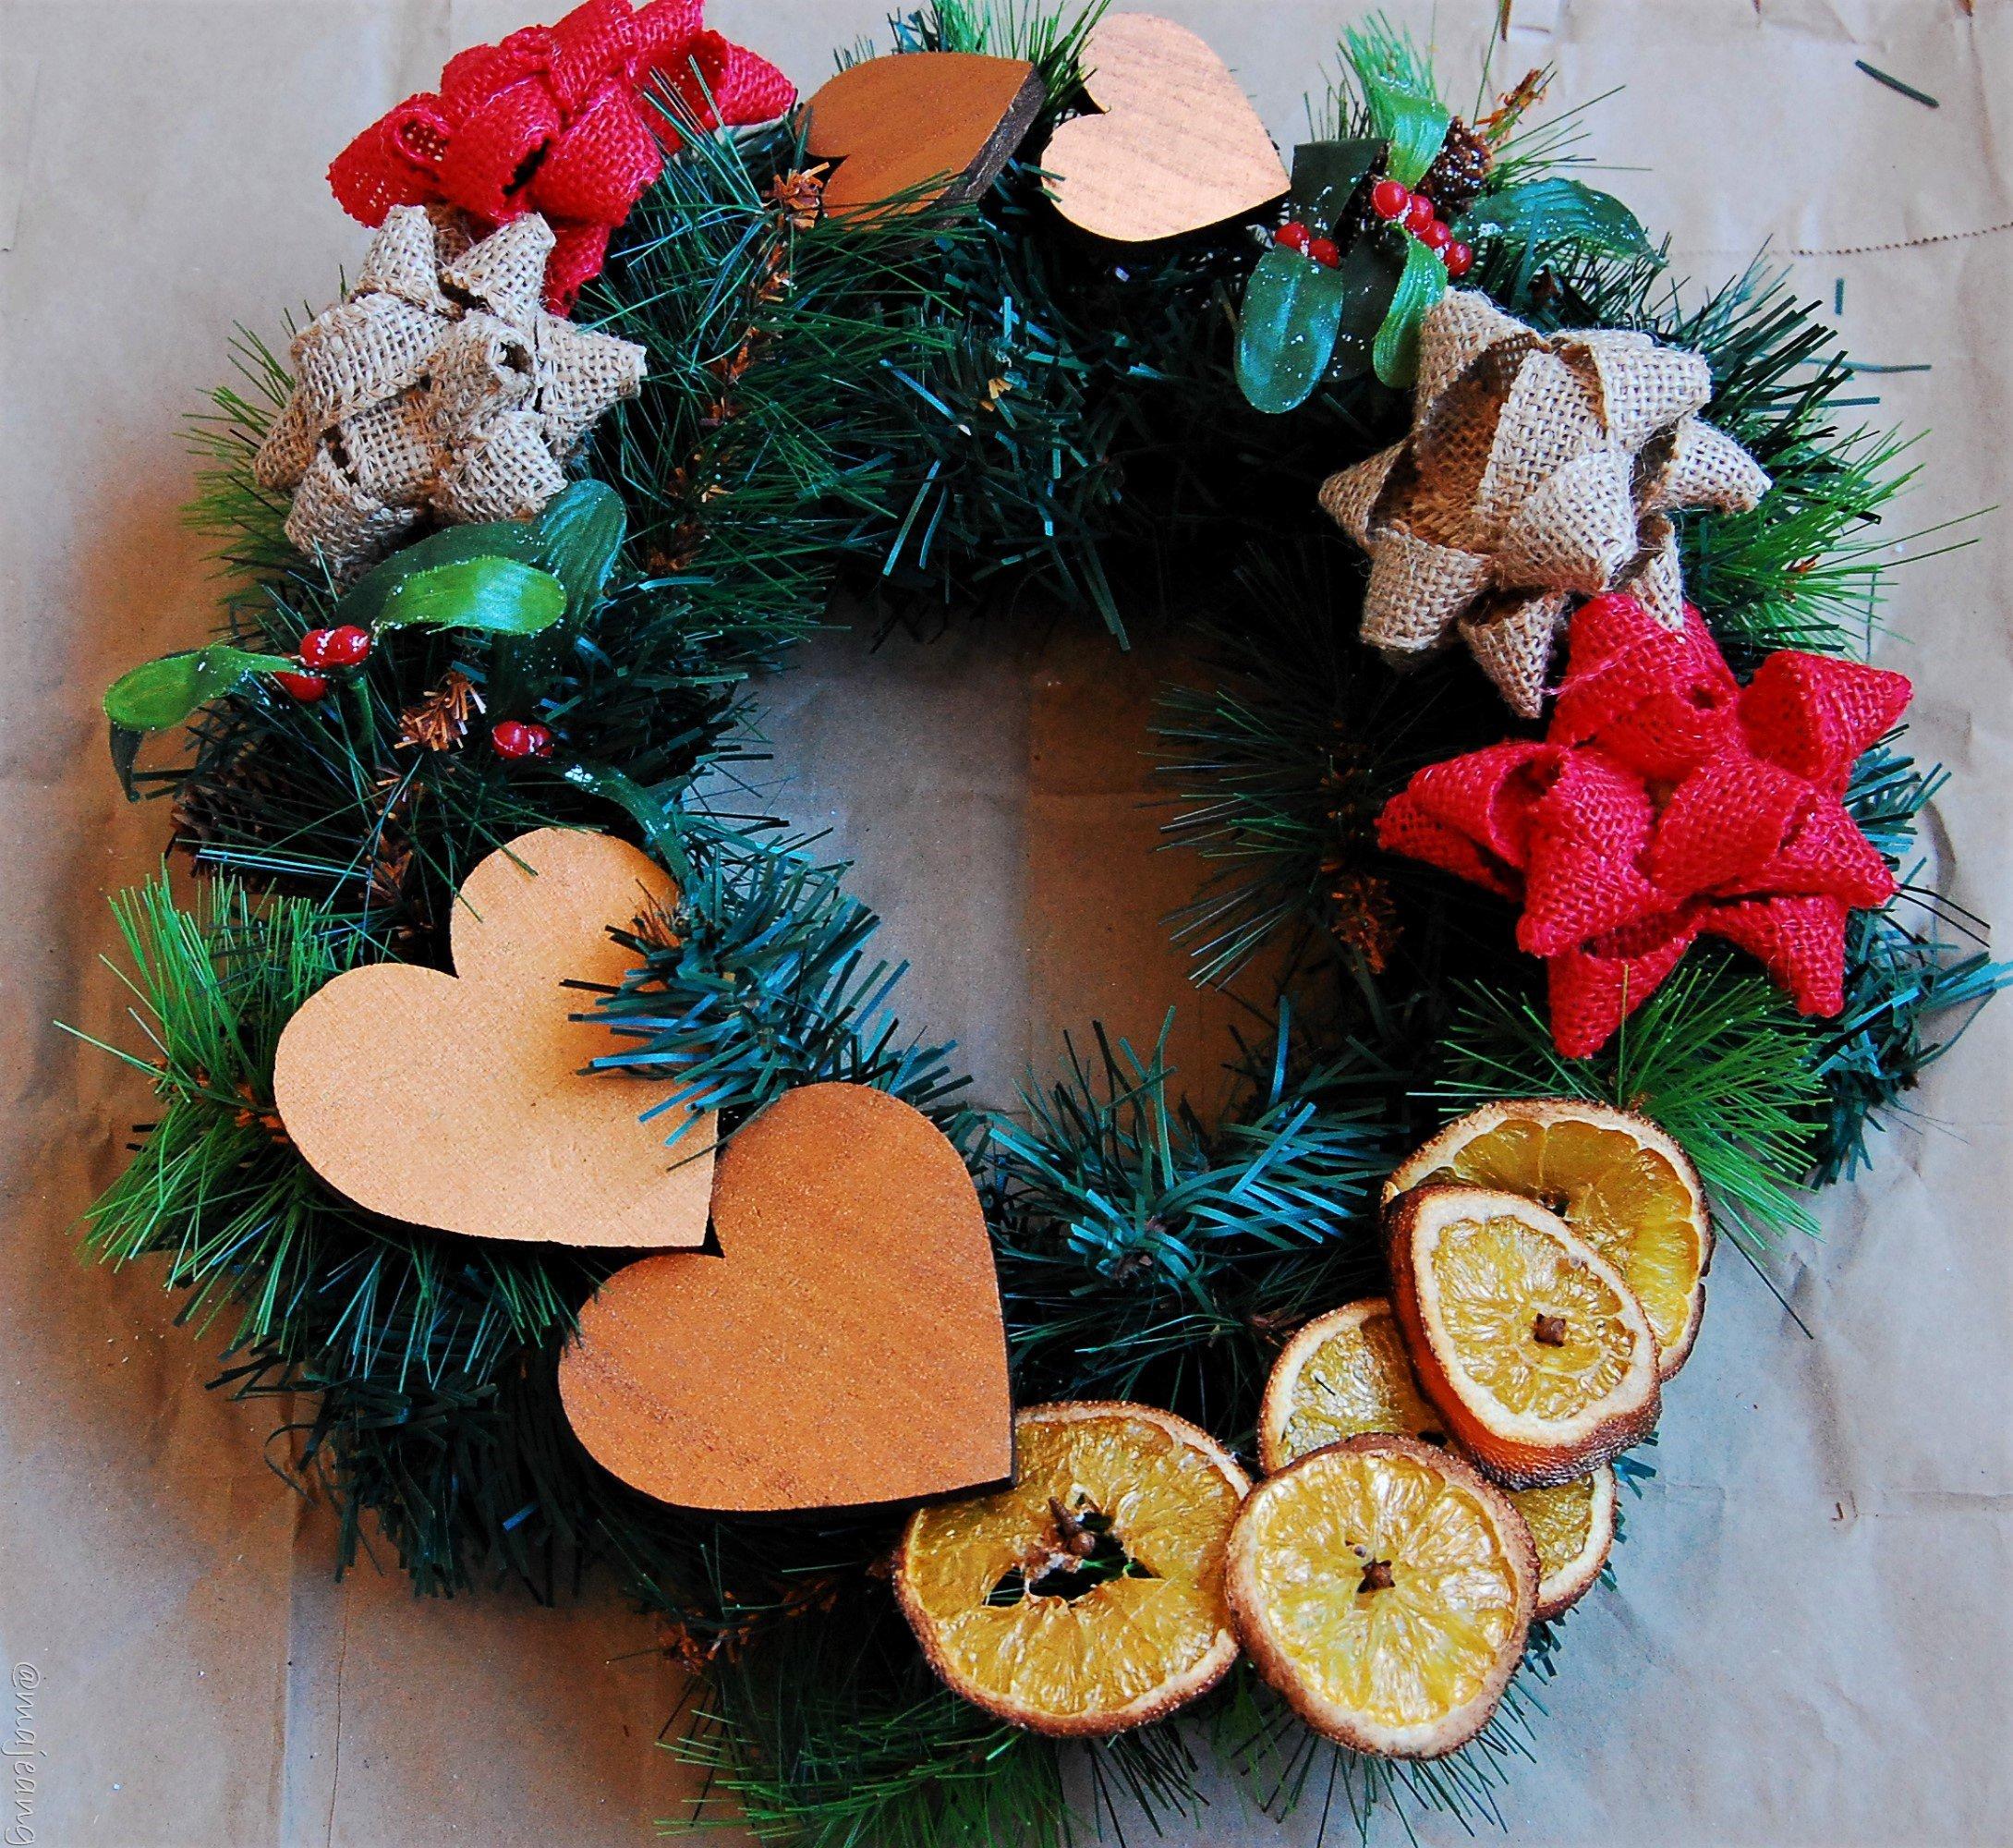 Christmas diy wreath - majeang.com